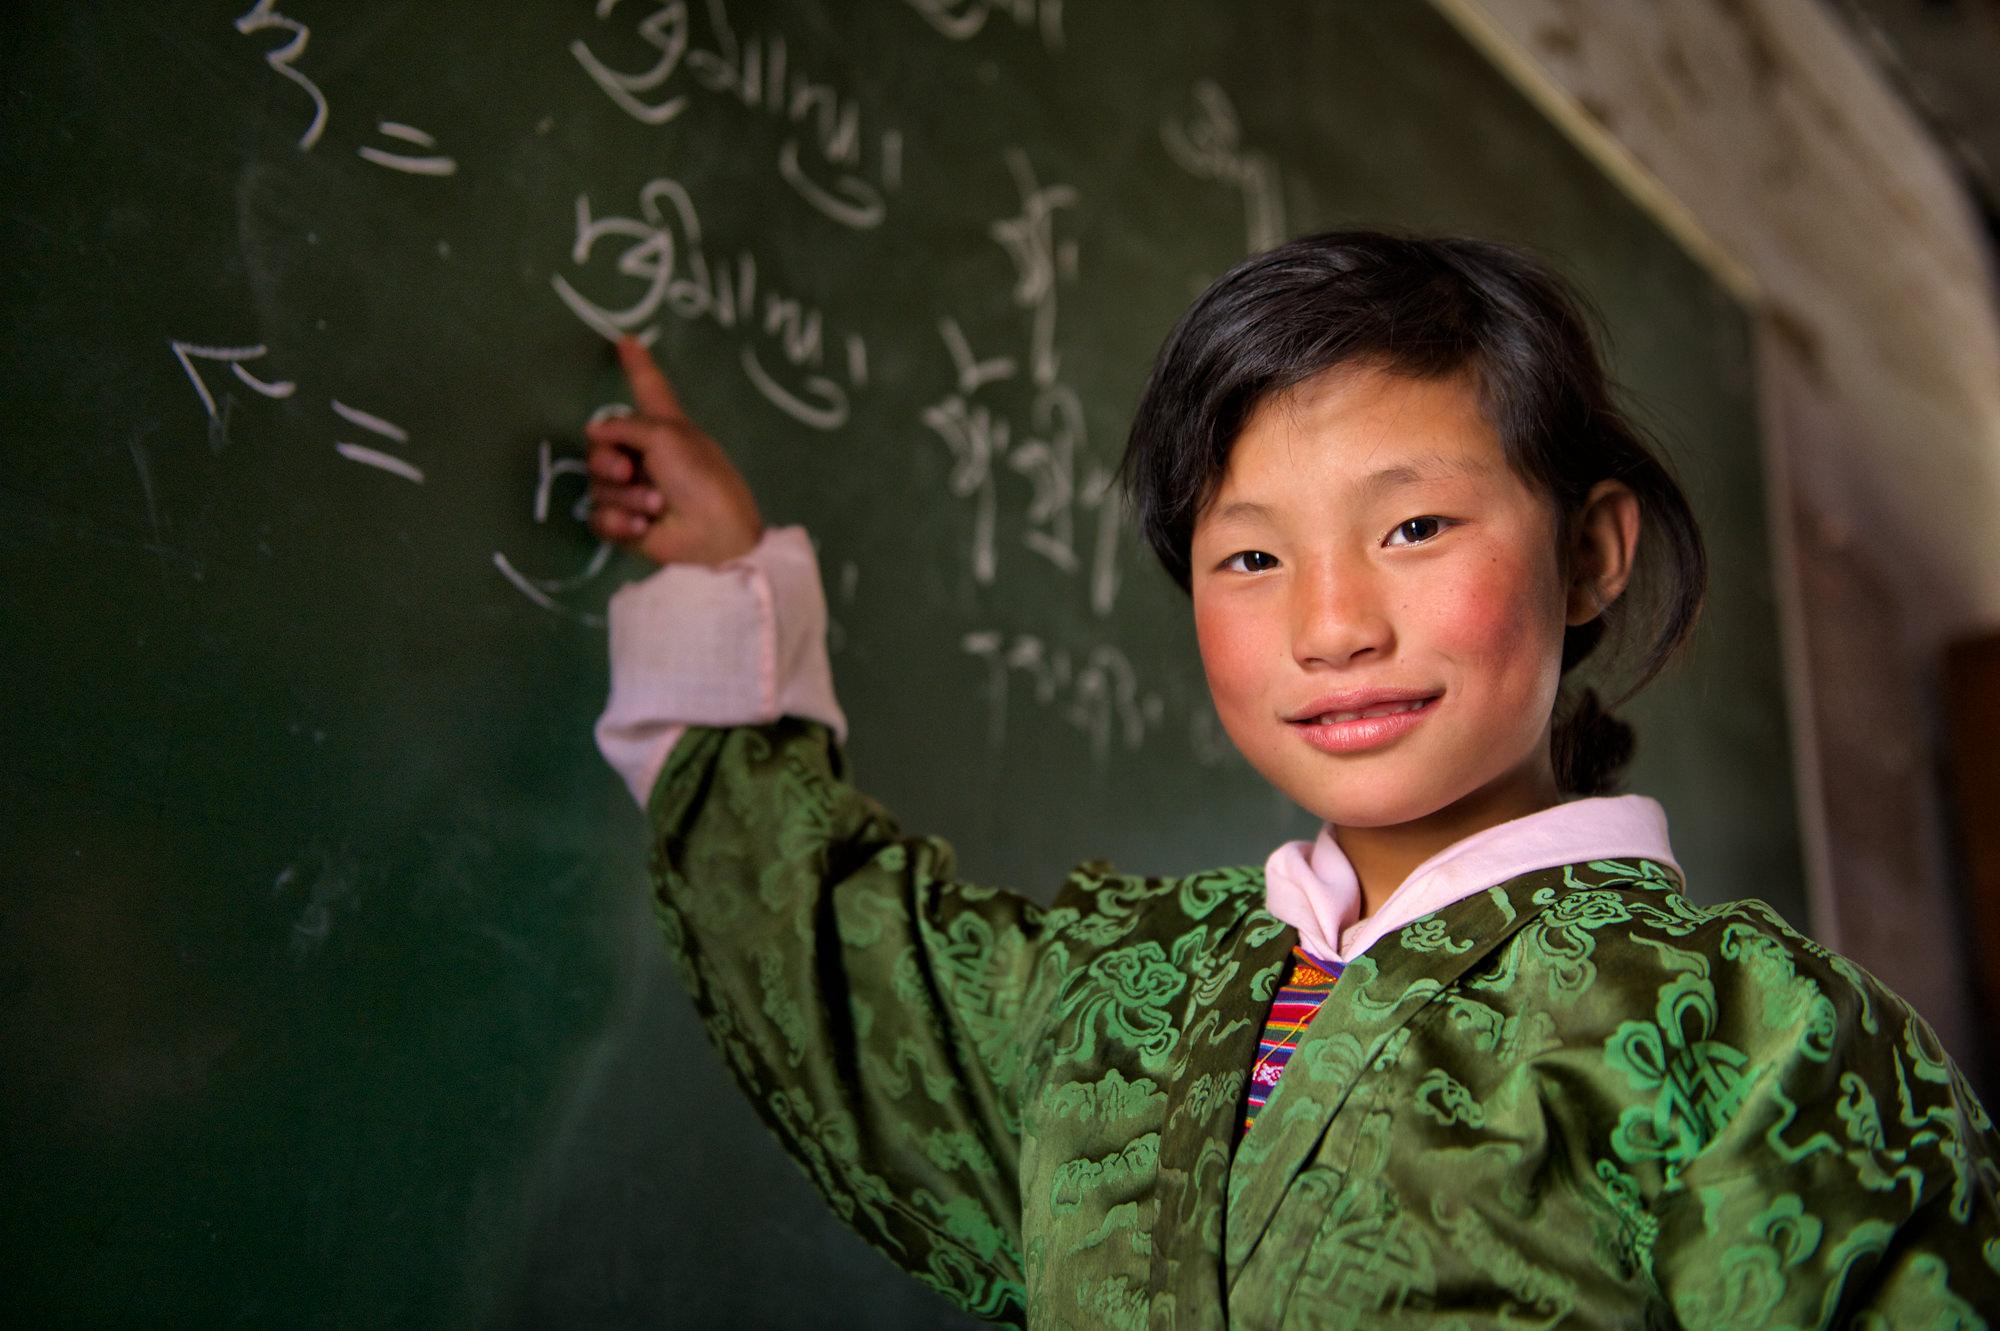 Reisefotografie - Schulmädchen in Bhutan